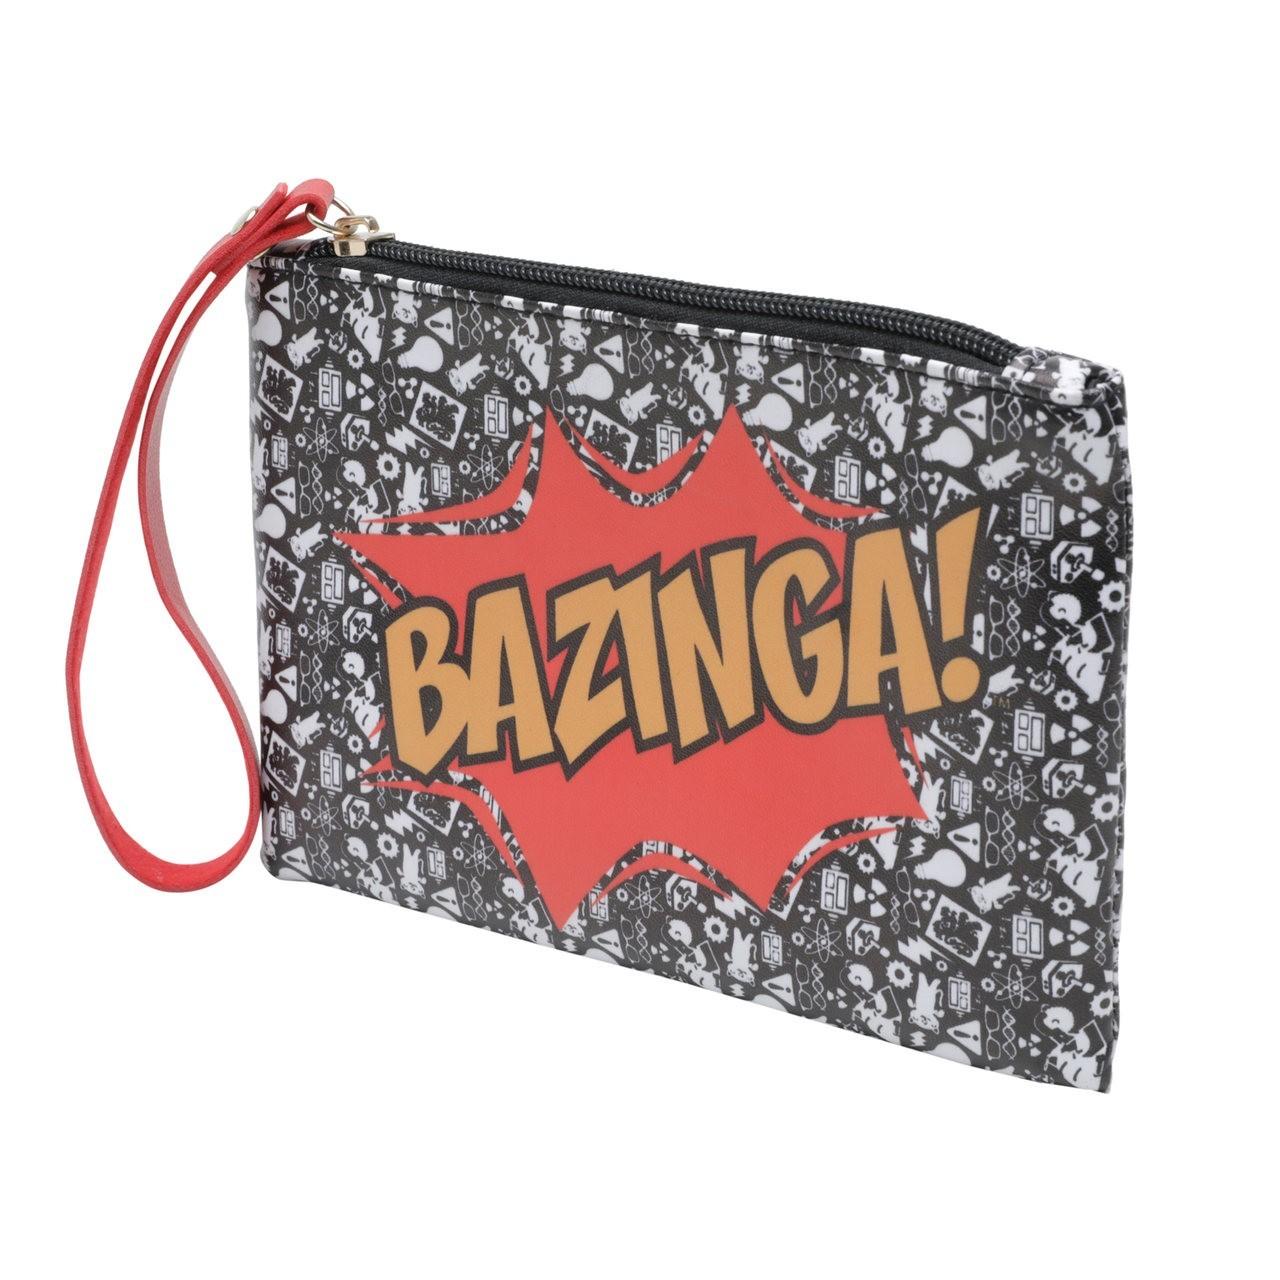 Carteira Bazinga The big bang theory - Urban